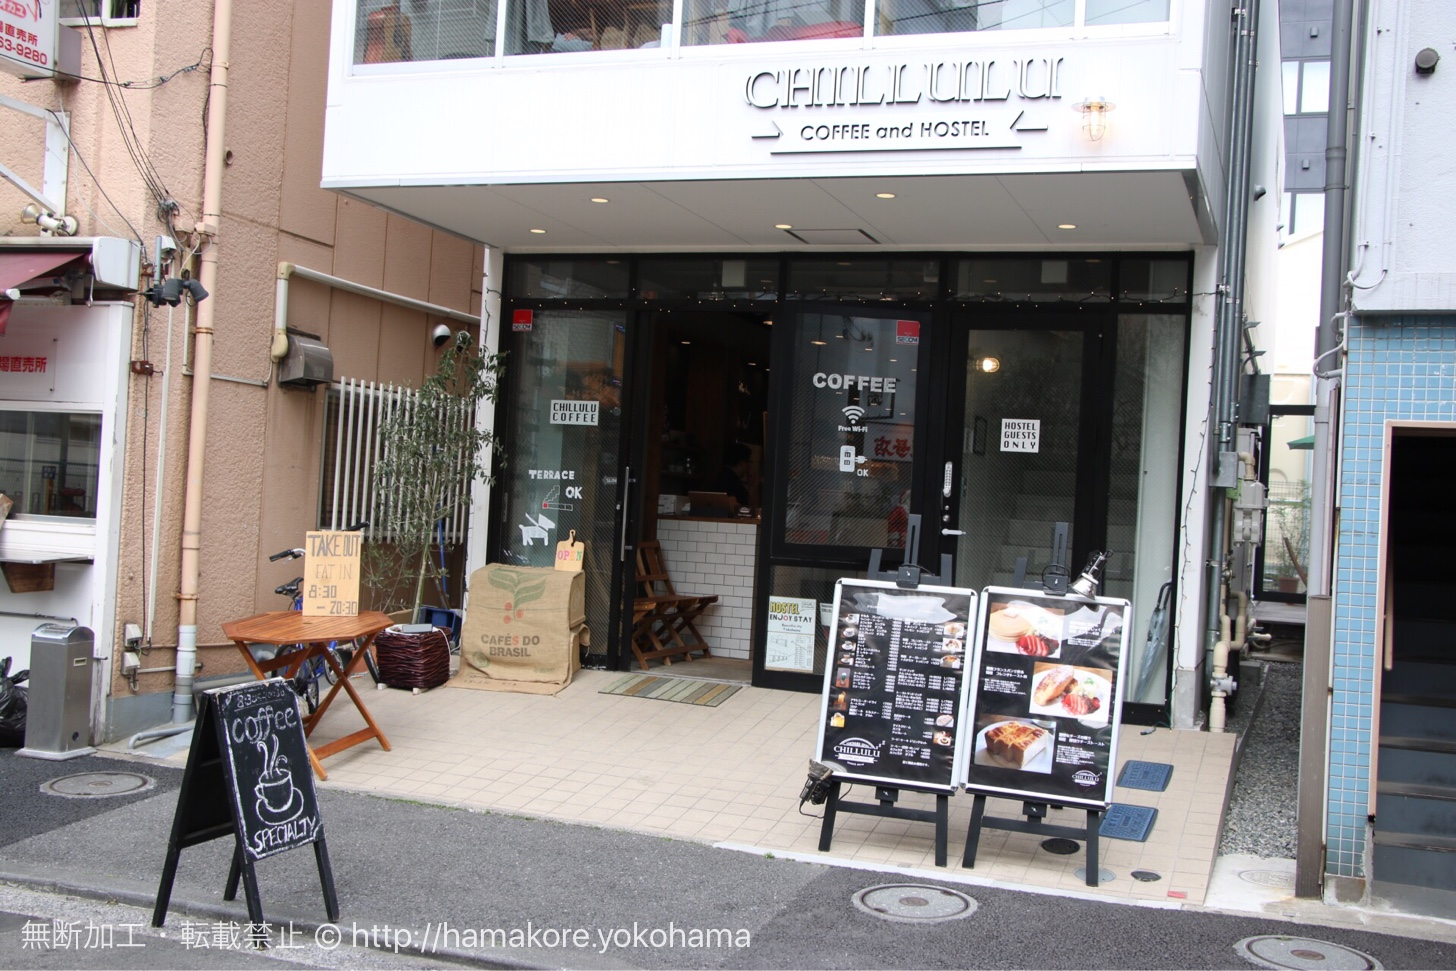 CHILLULU COFFEE 外観